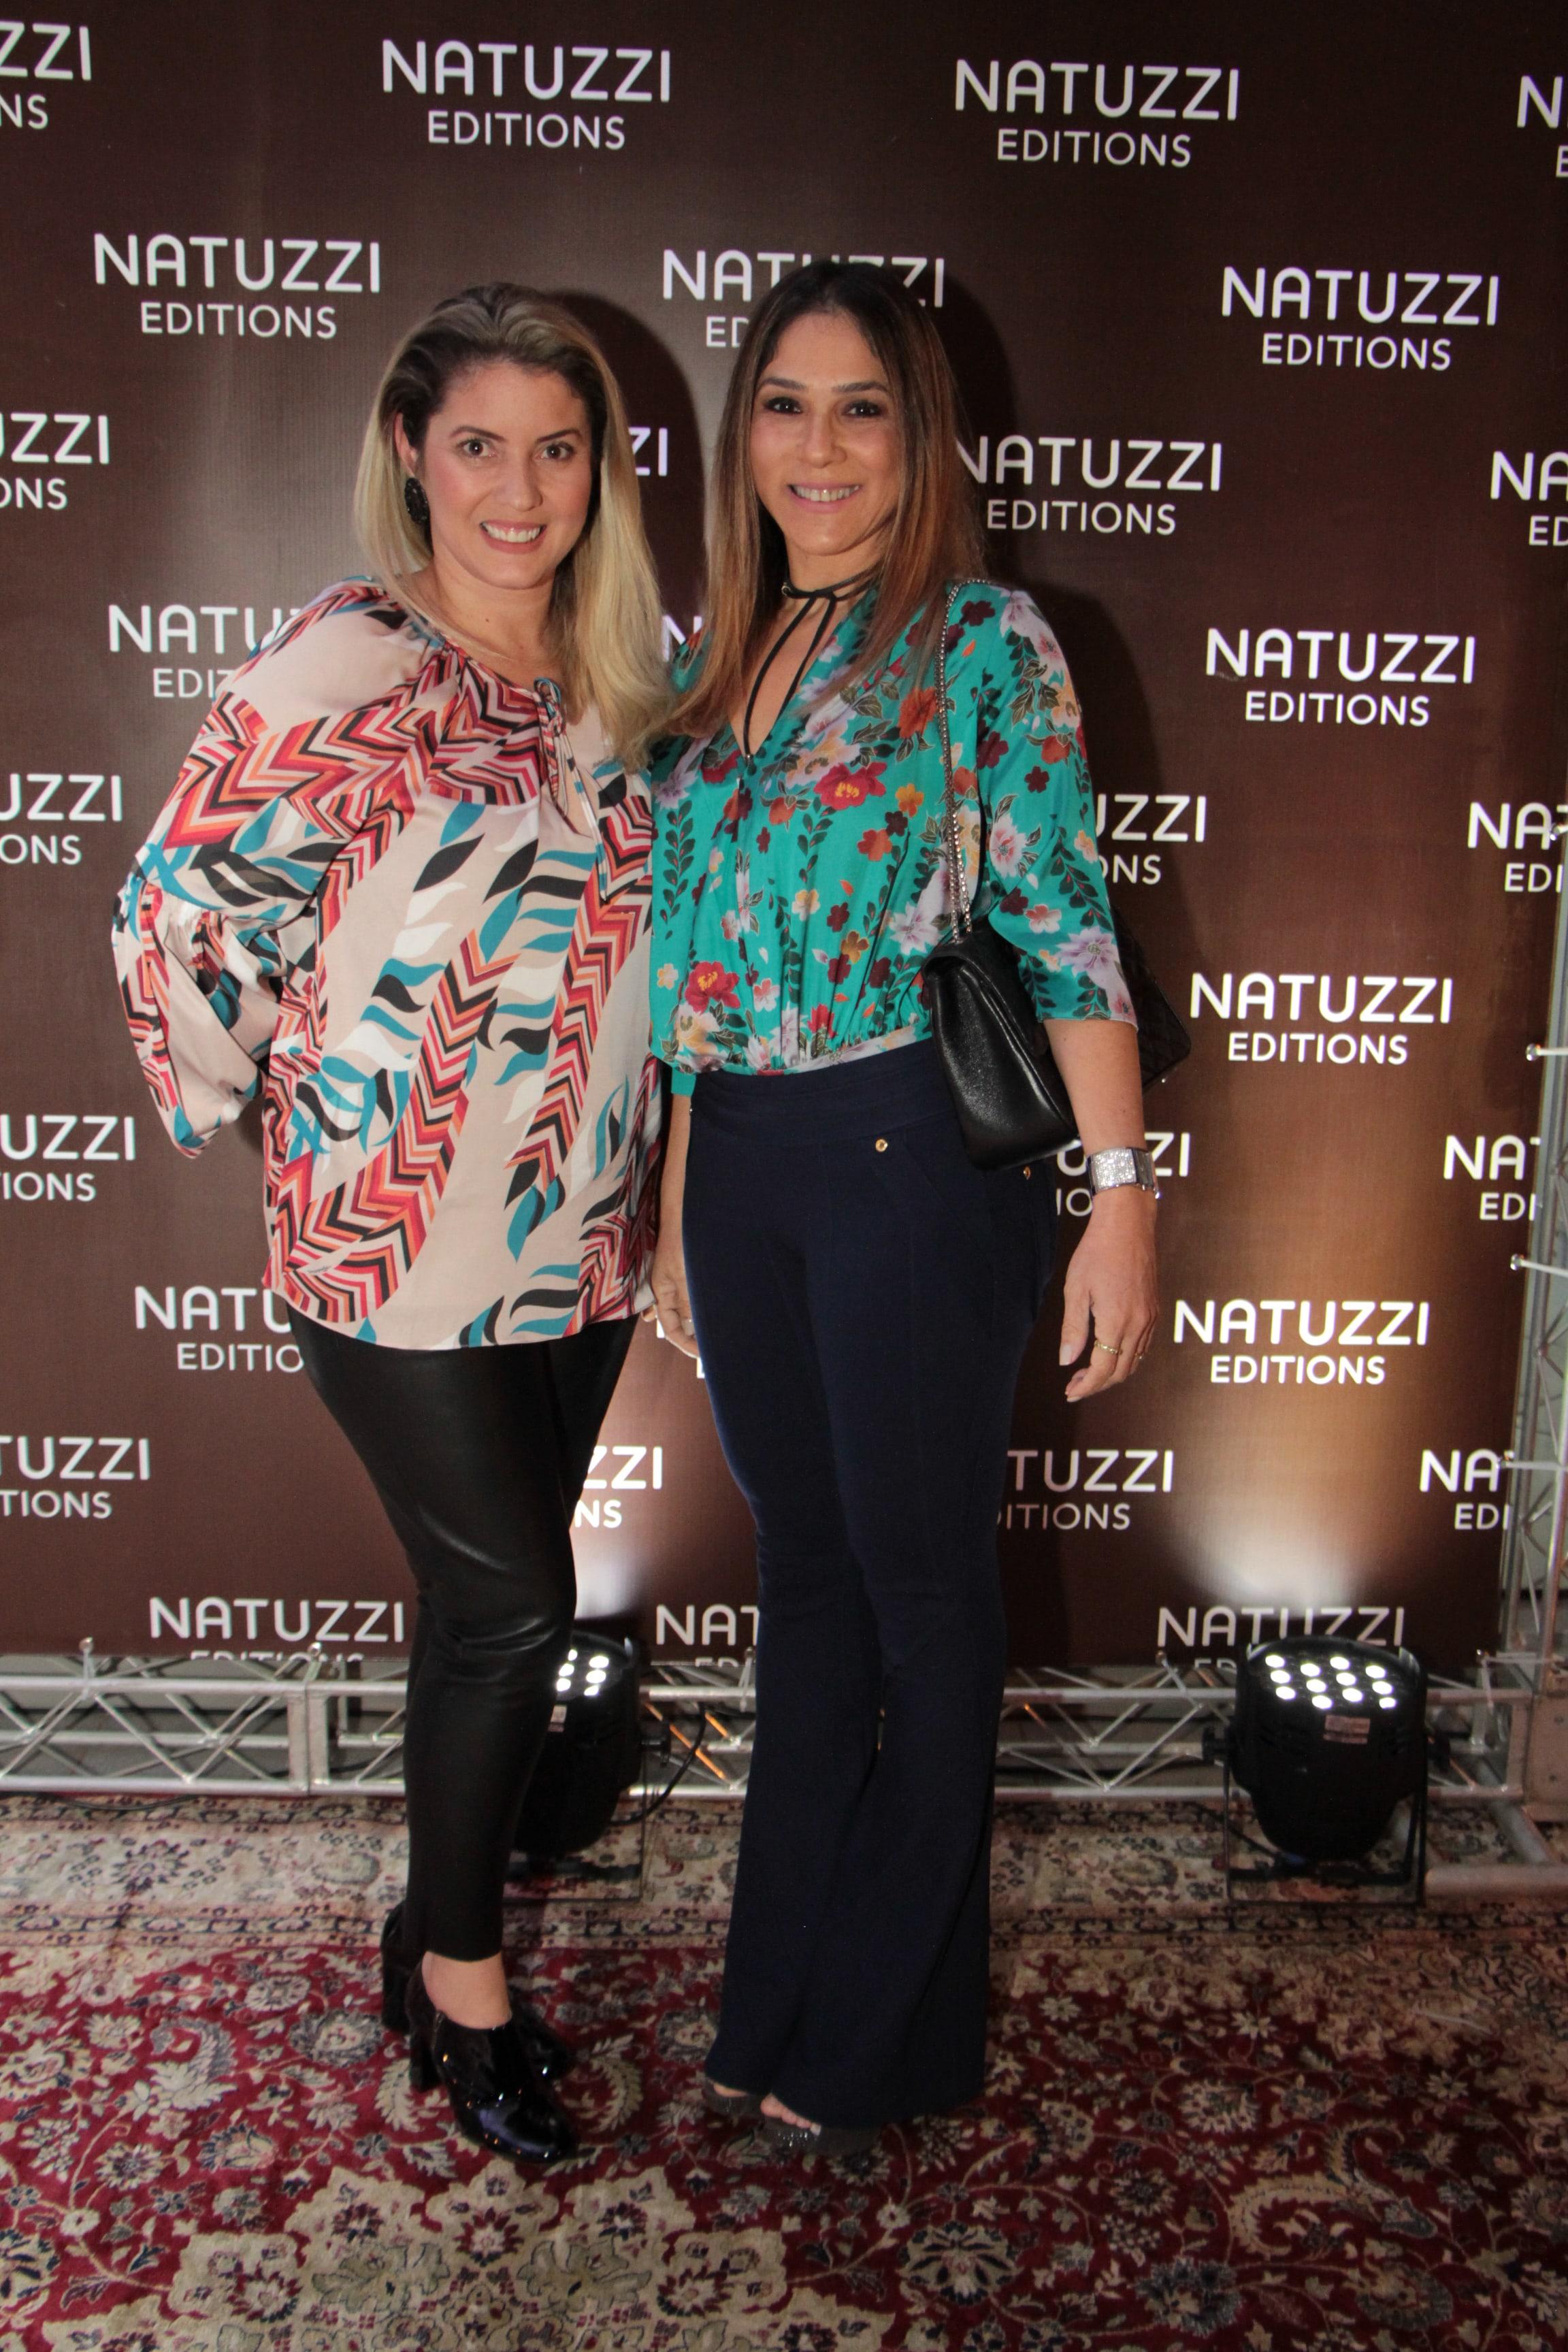 Natuzzi (69)-min.JPG